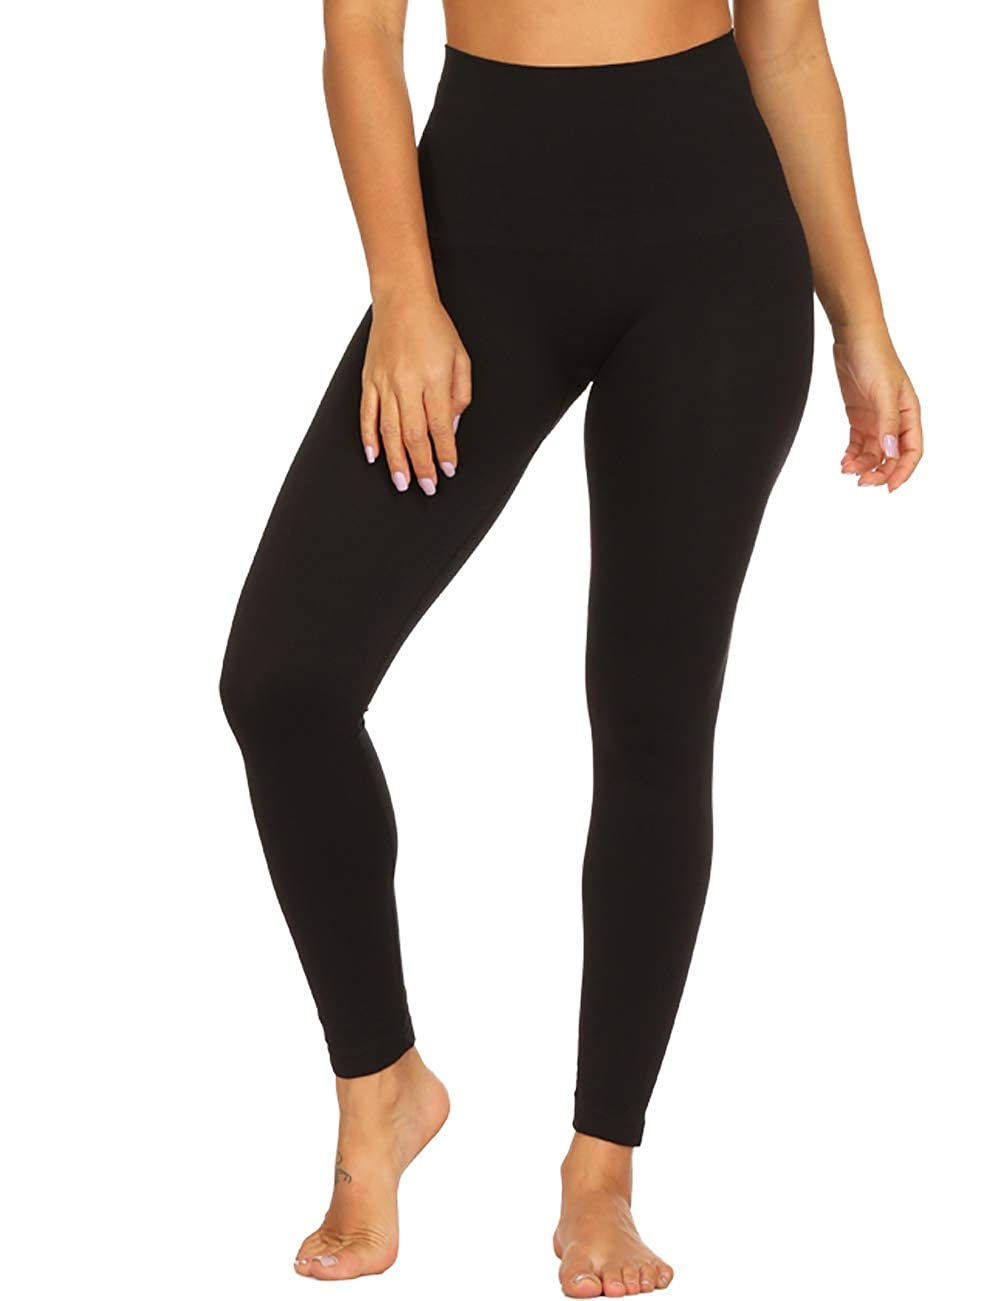 TRAINER SECRET Women Premium Thick High Waist Tummy Compression Slimming Seamless Leggings